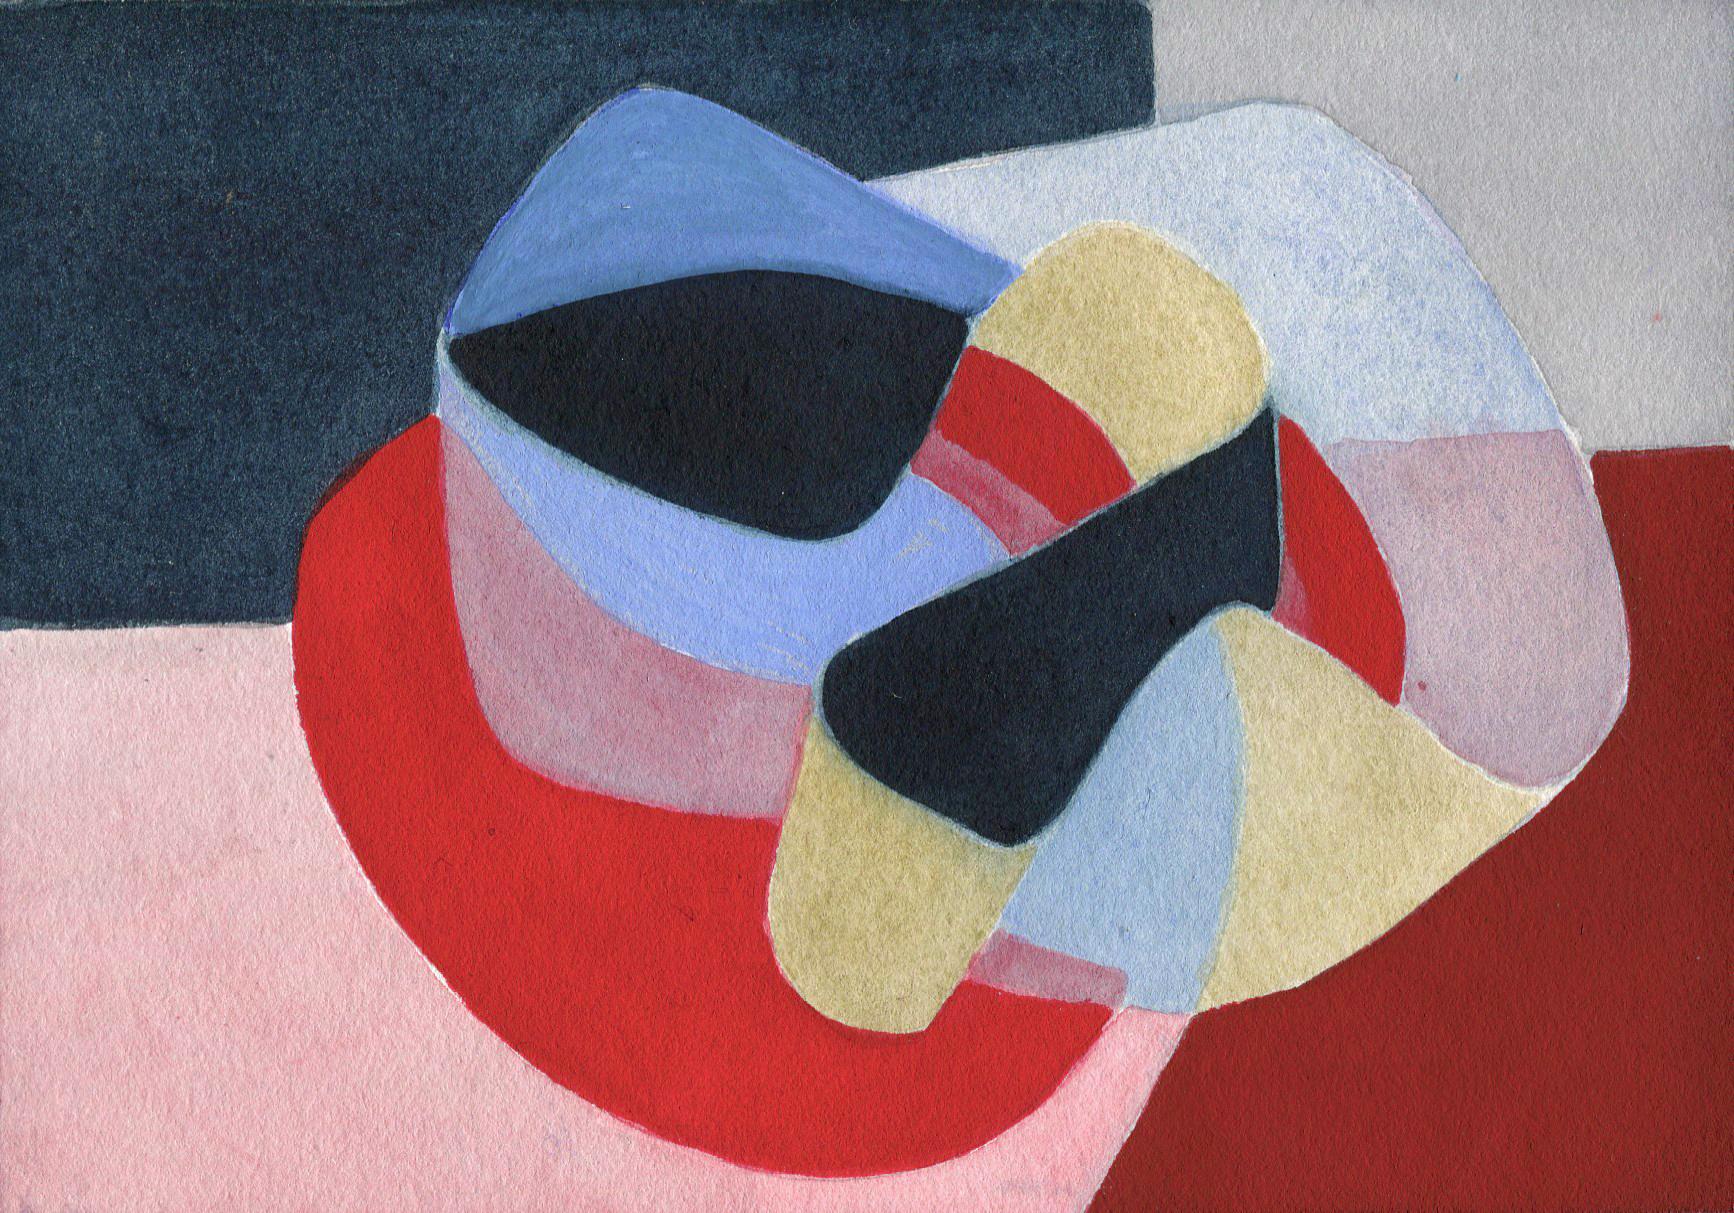 Tooney Phillips - Untitled 3 (1).jpg